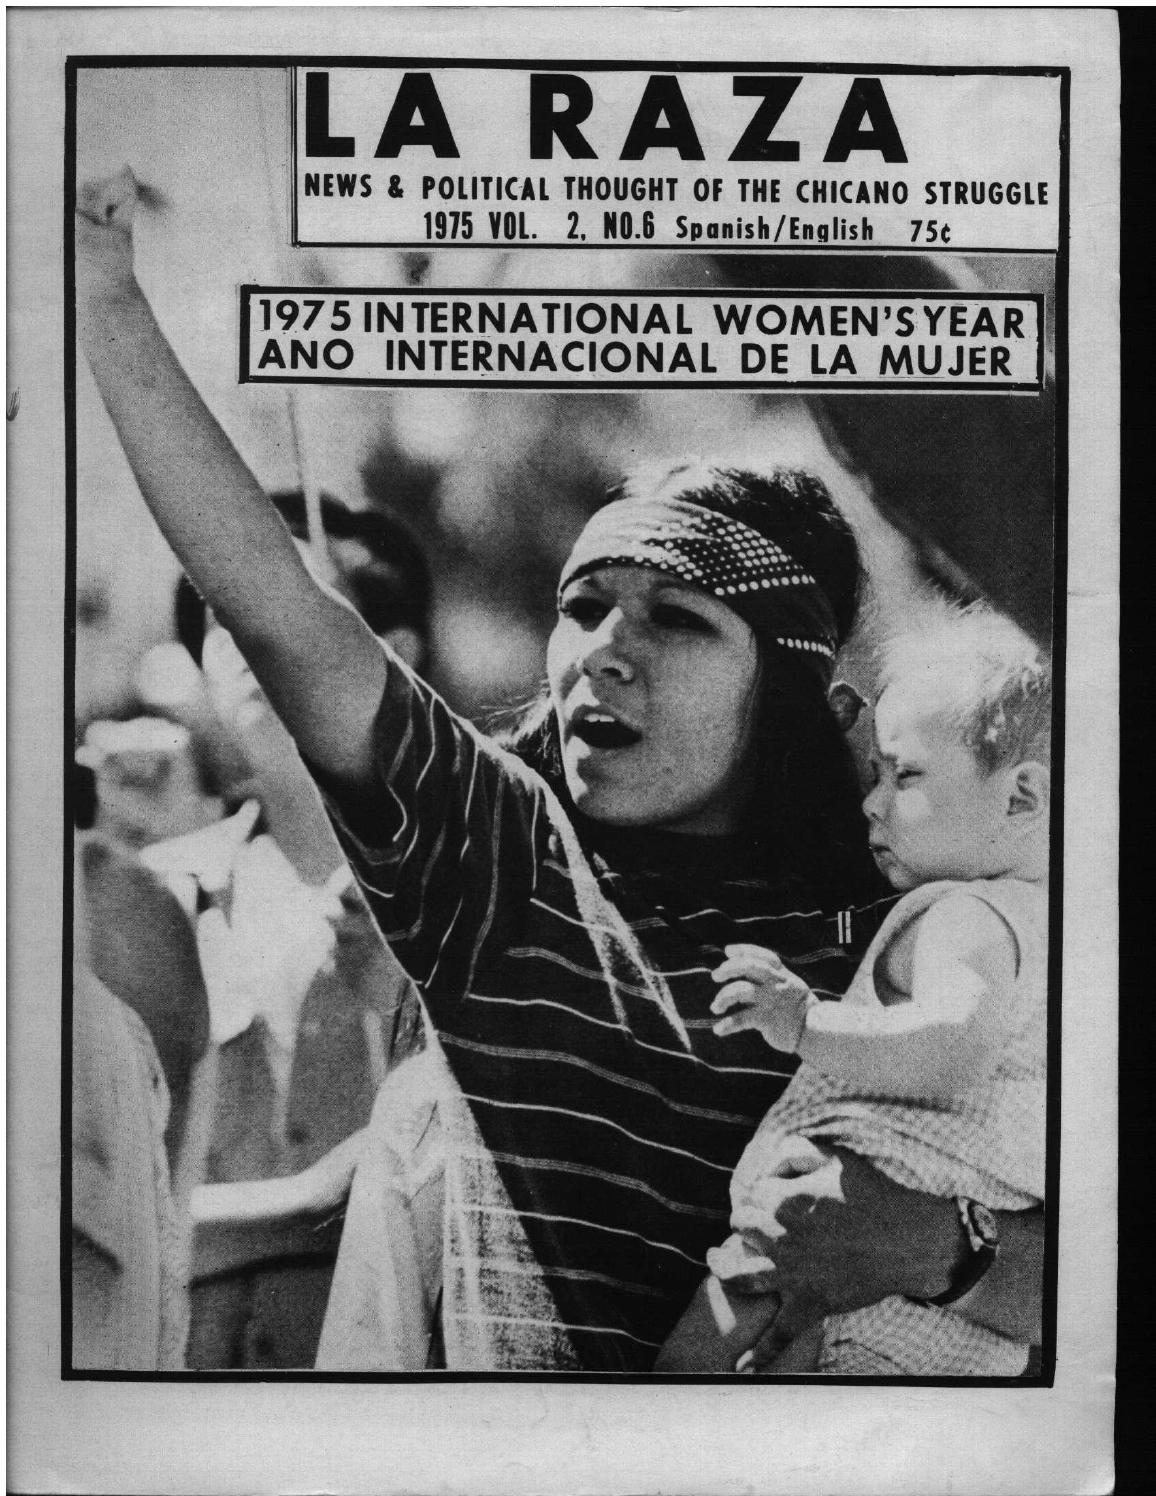 LA RAZA: NEWS & POLITICAL THOUGHT OF THE CHICANO STRUGGLE